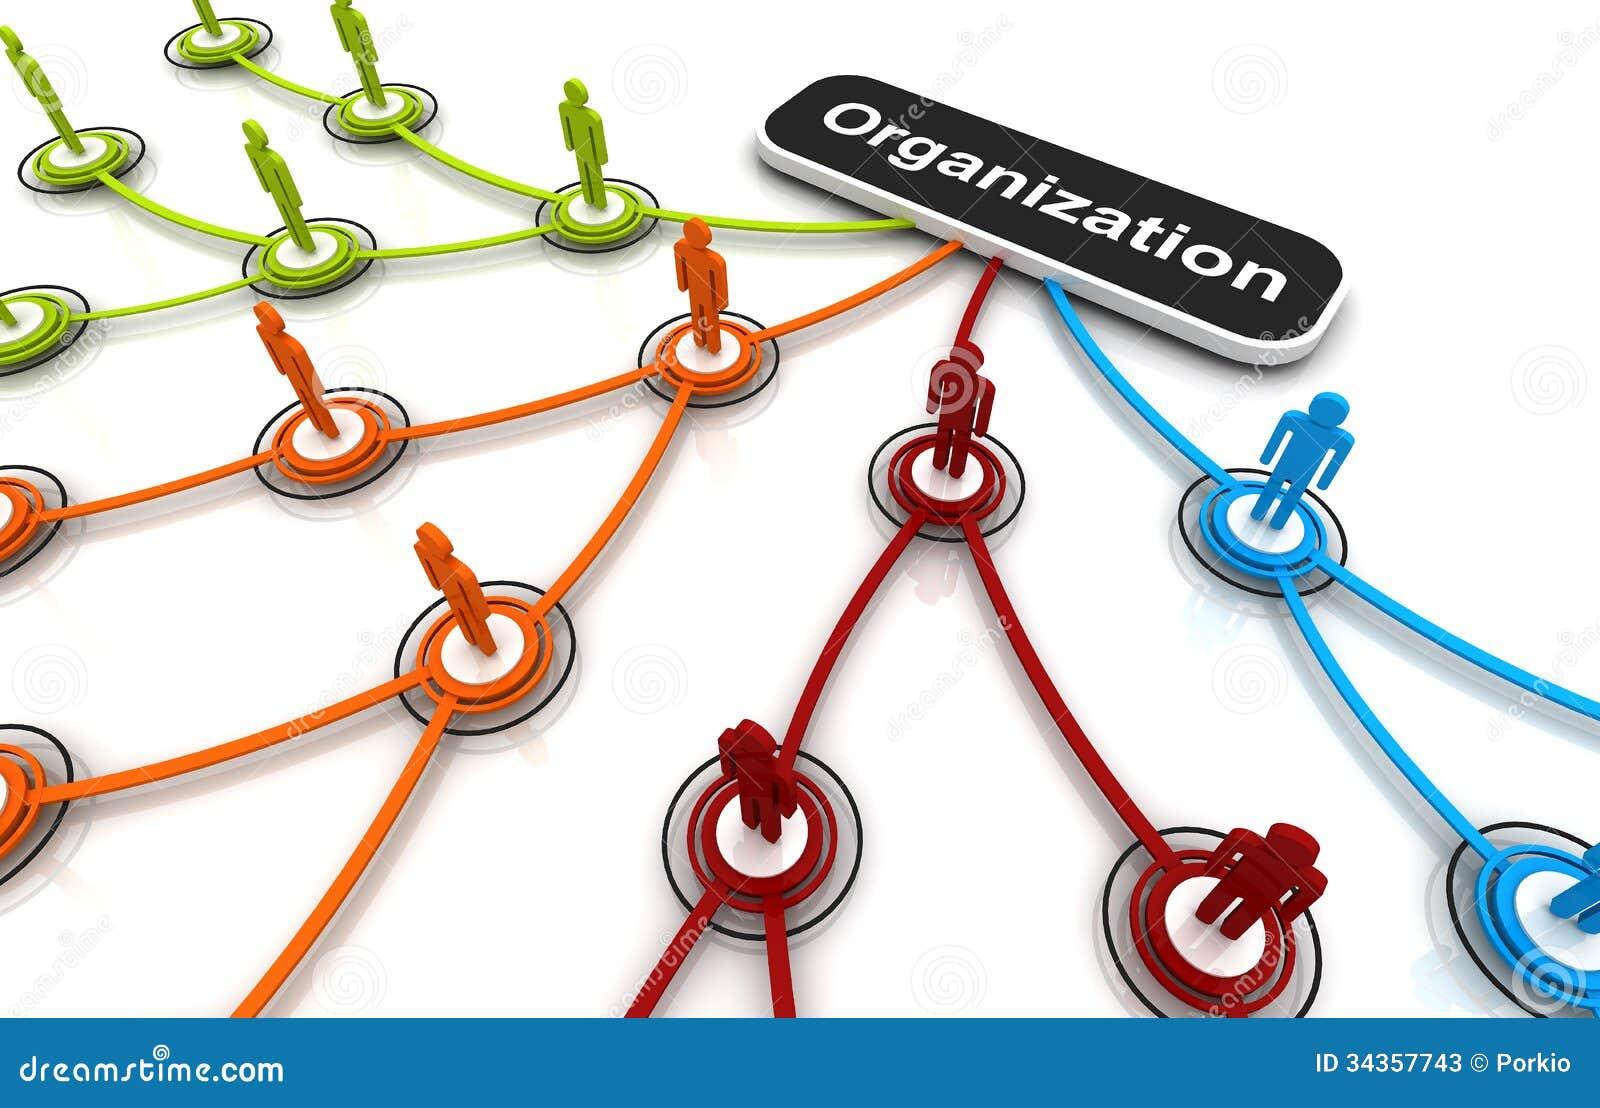 3d organization chart royalty free stock photo image 17230335